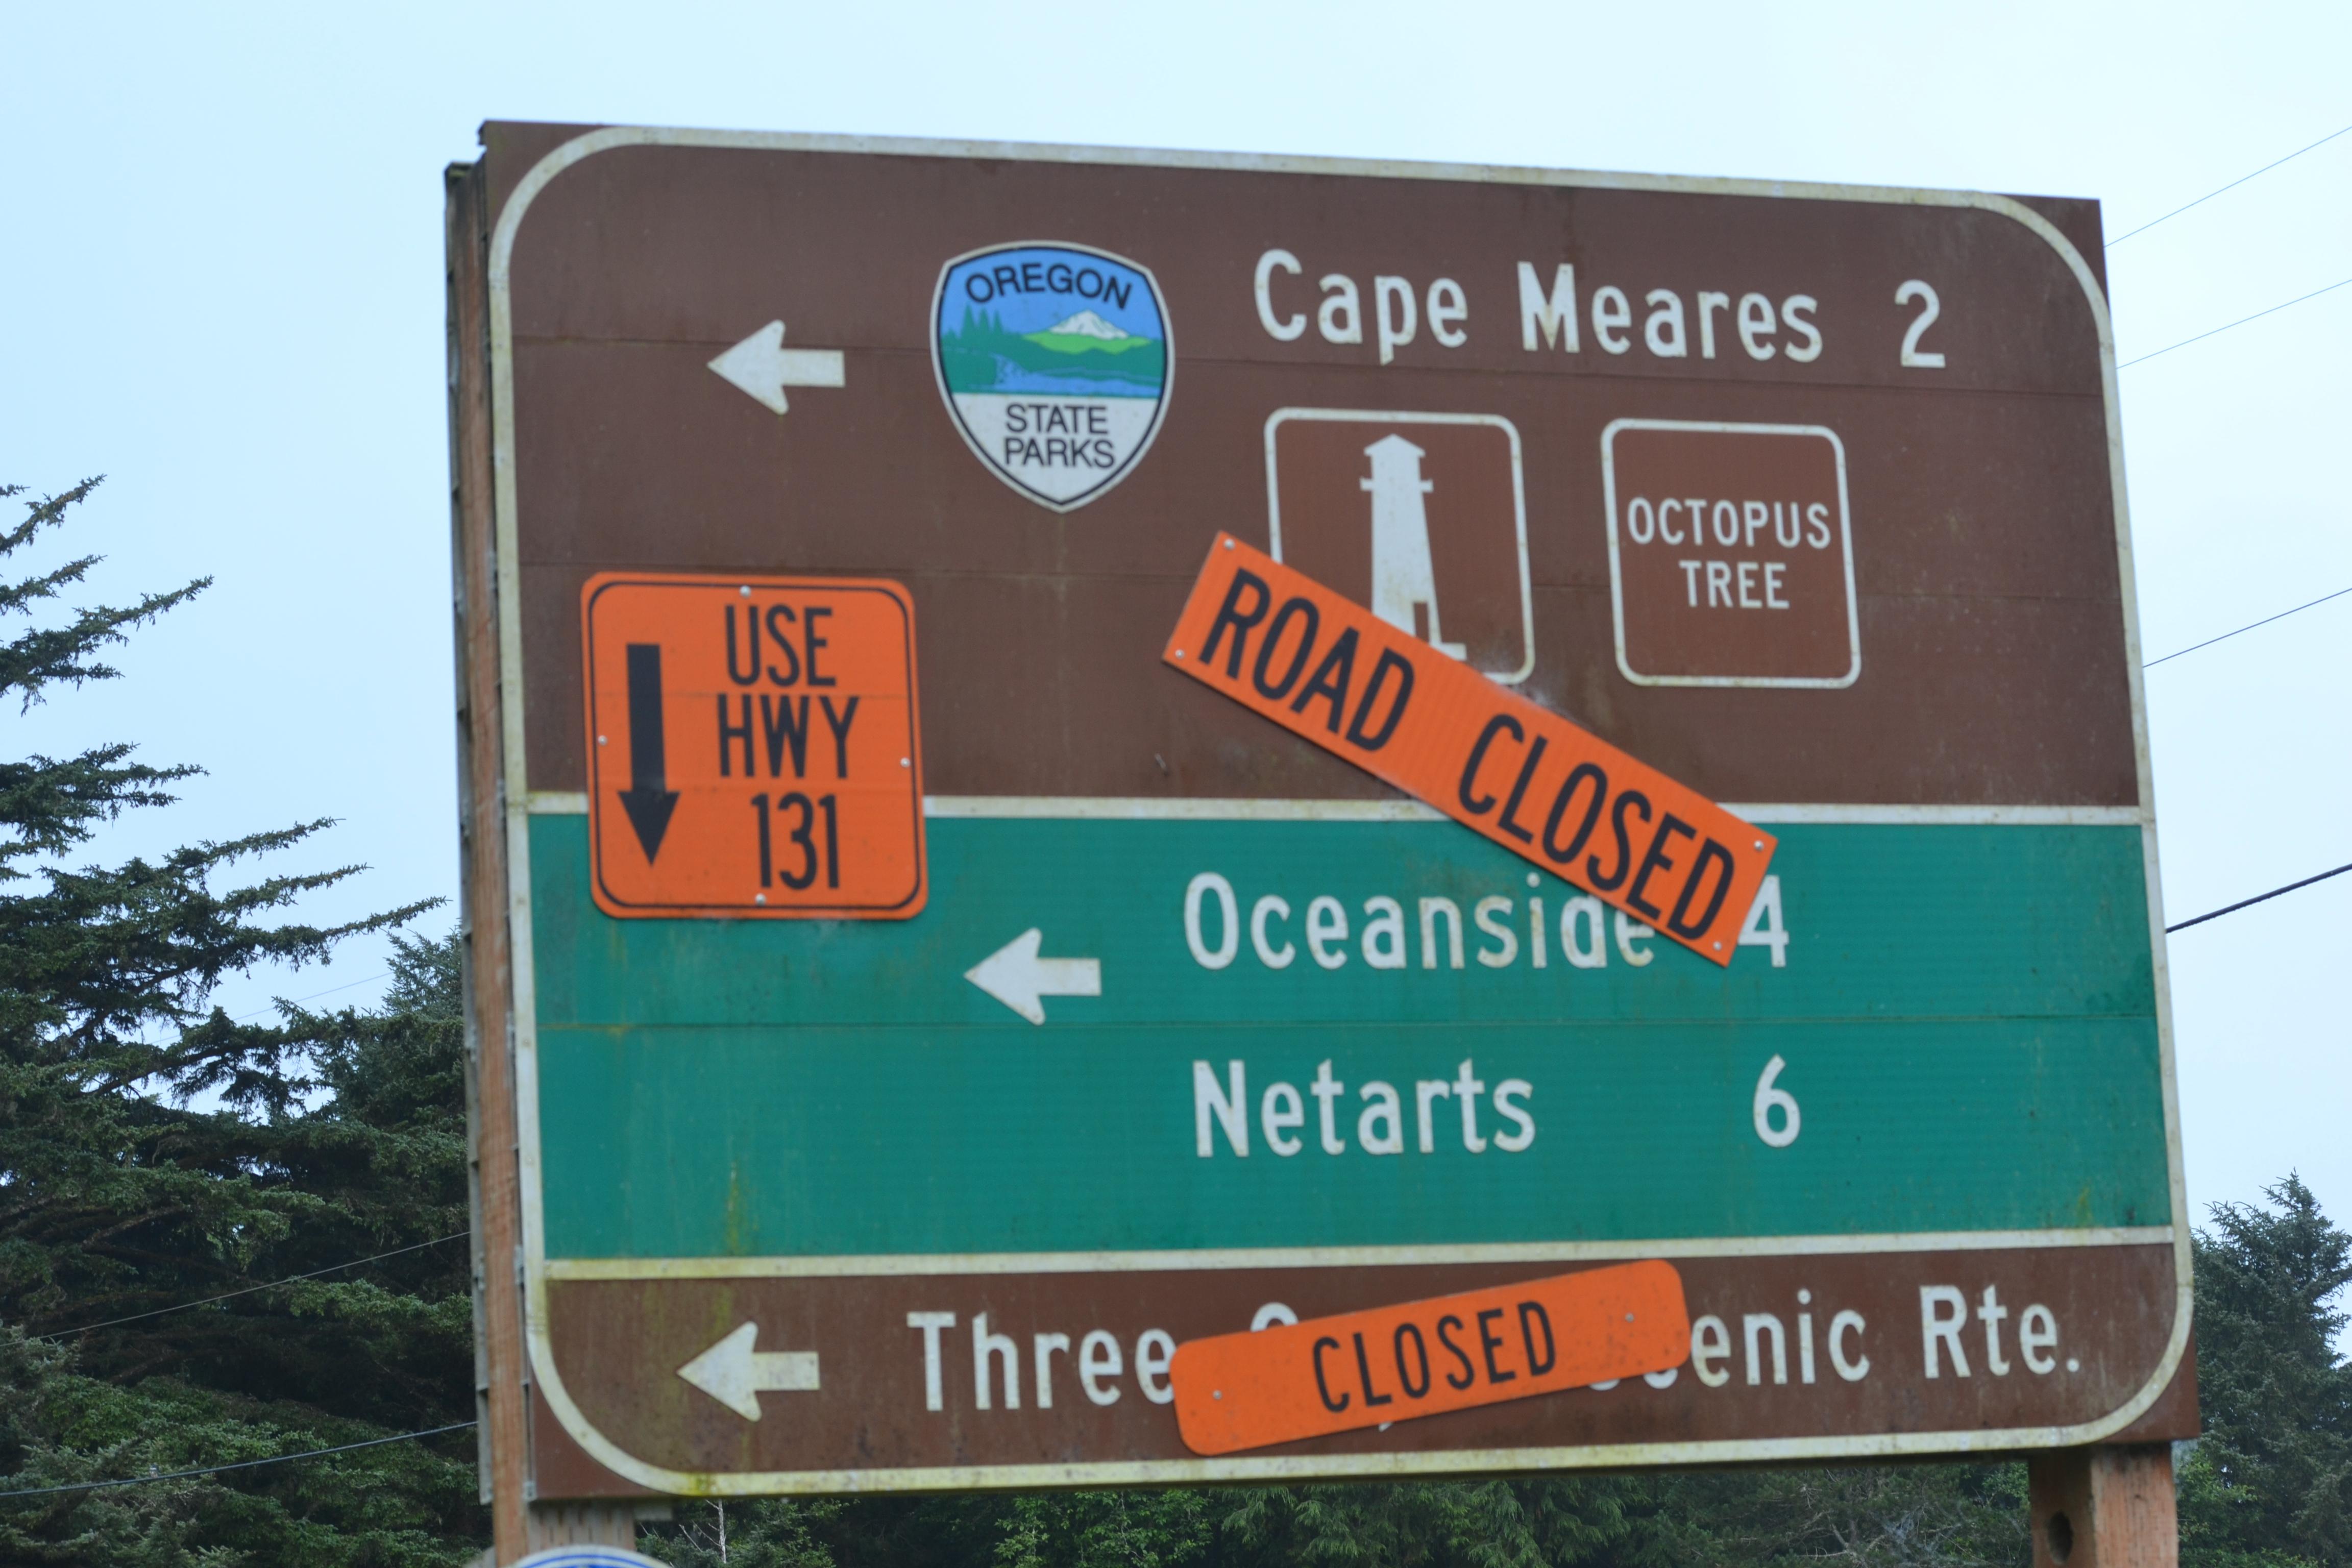 DSC_0001 (3)Cape Meares Road closure sign